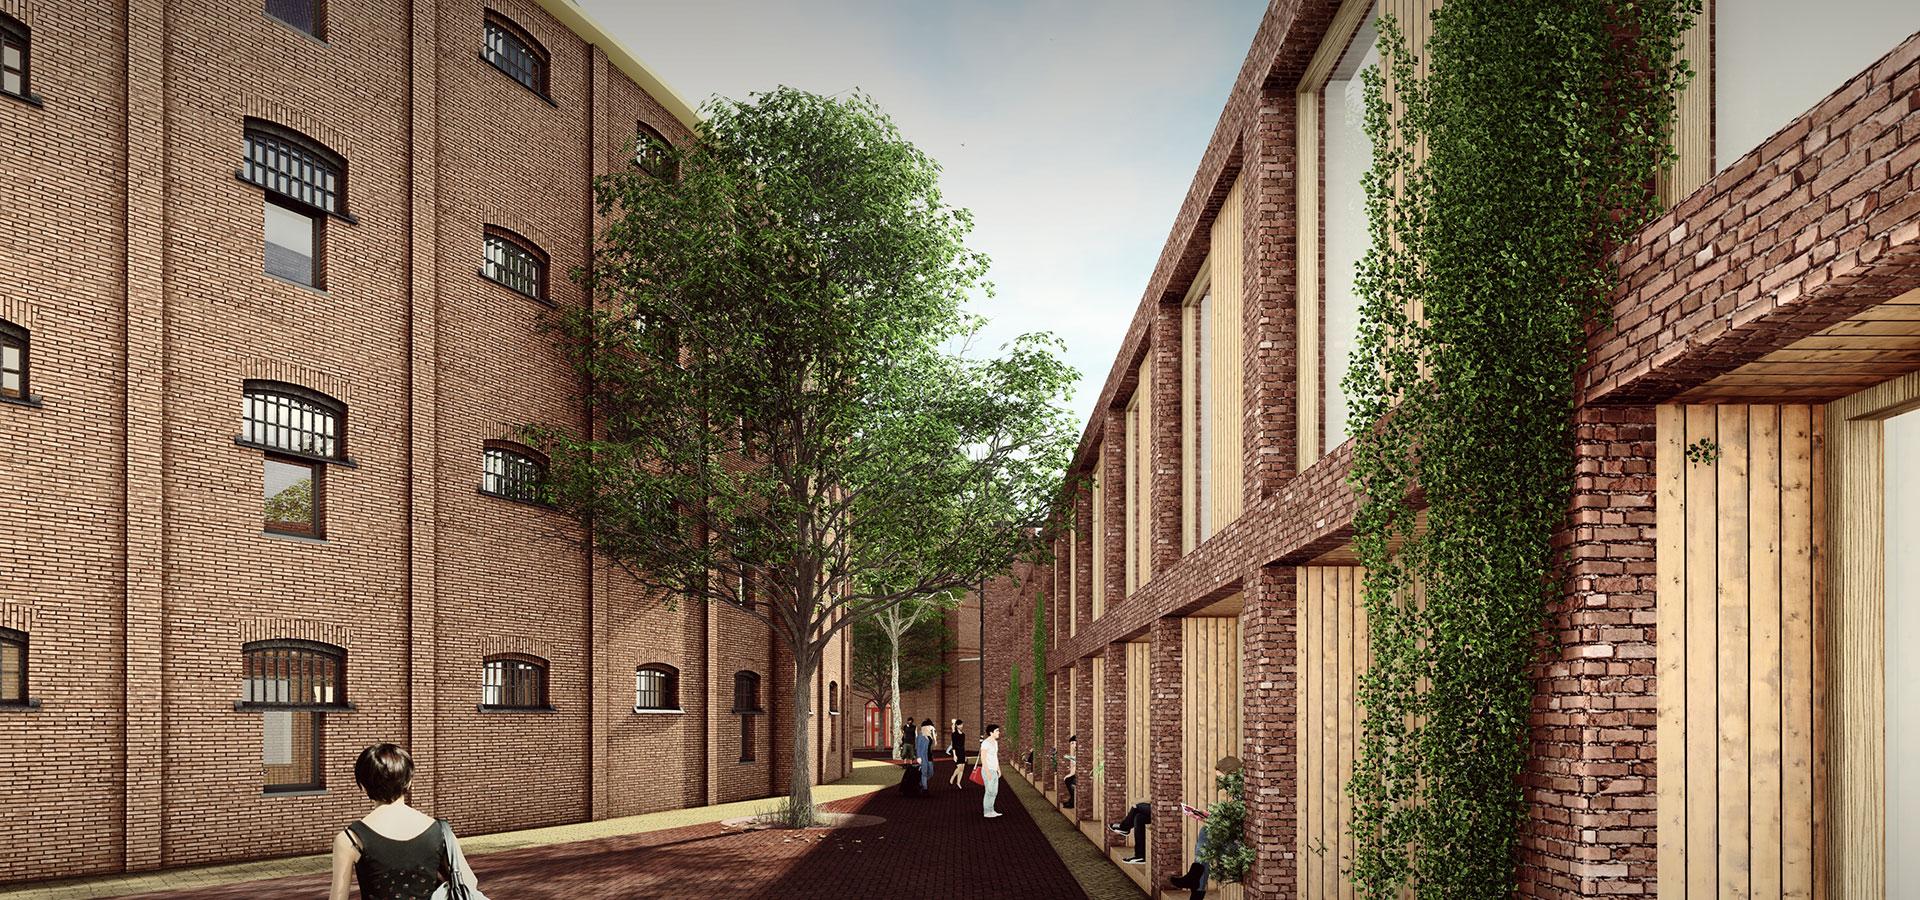 FARO architecten Koepel Haarlem 07